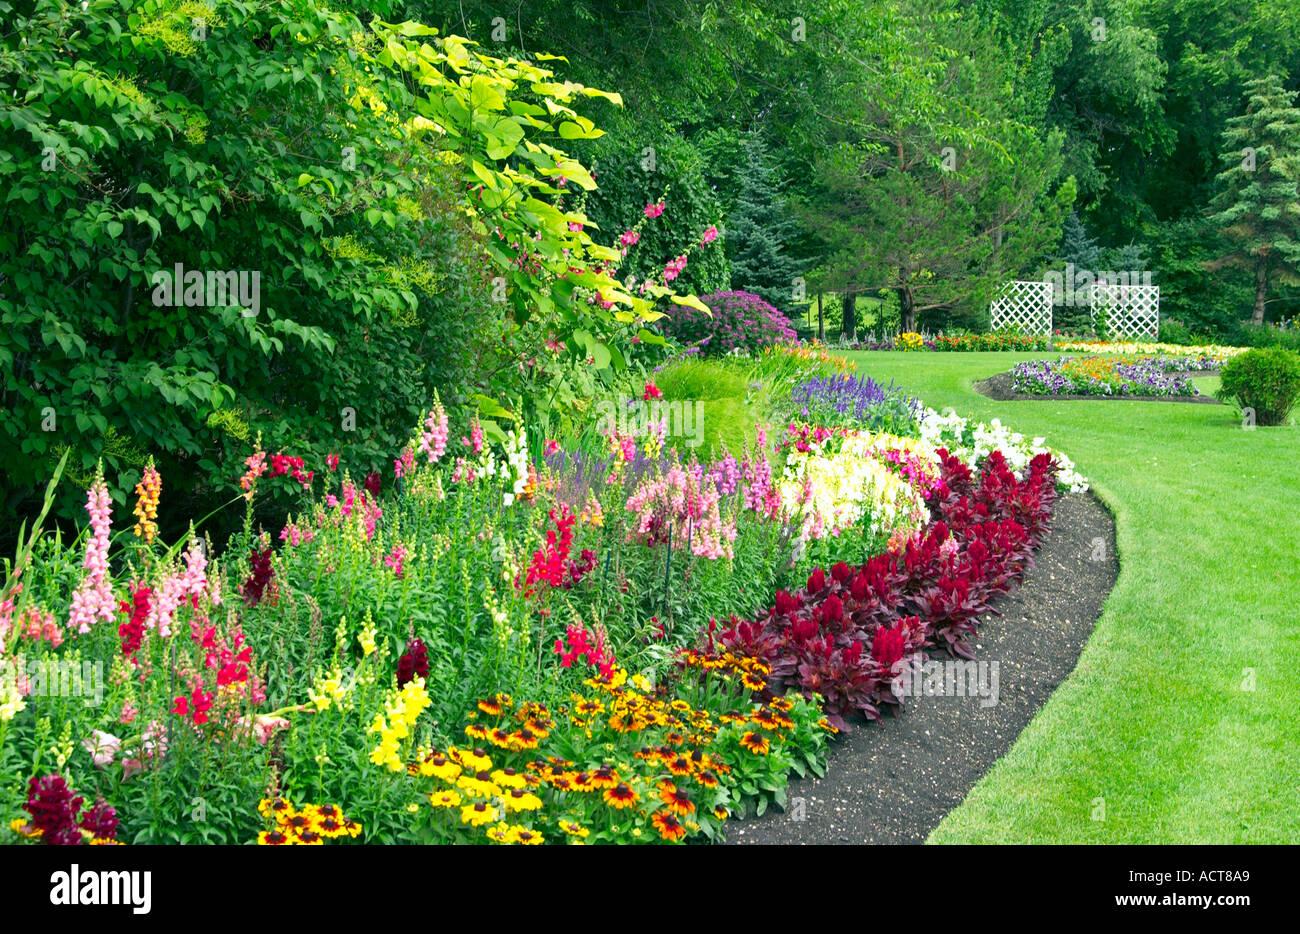 Formal Flower Garden In Kildonan Park In Winnipeg Manitoba Canada Stock Photo Alamy